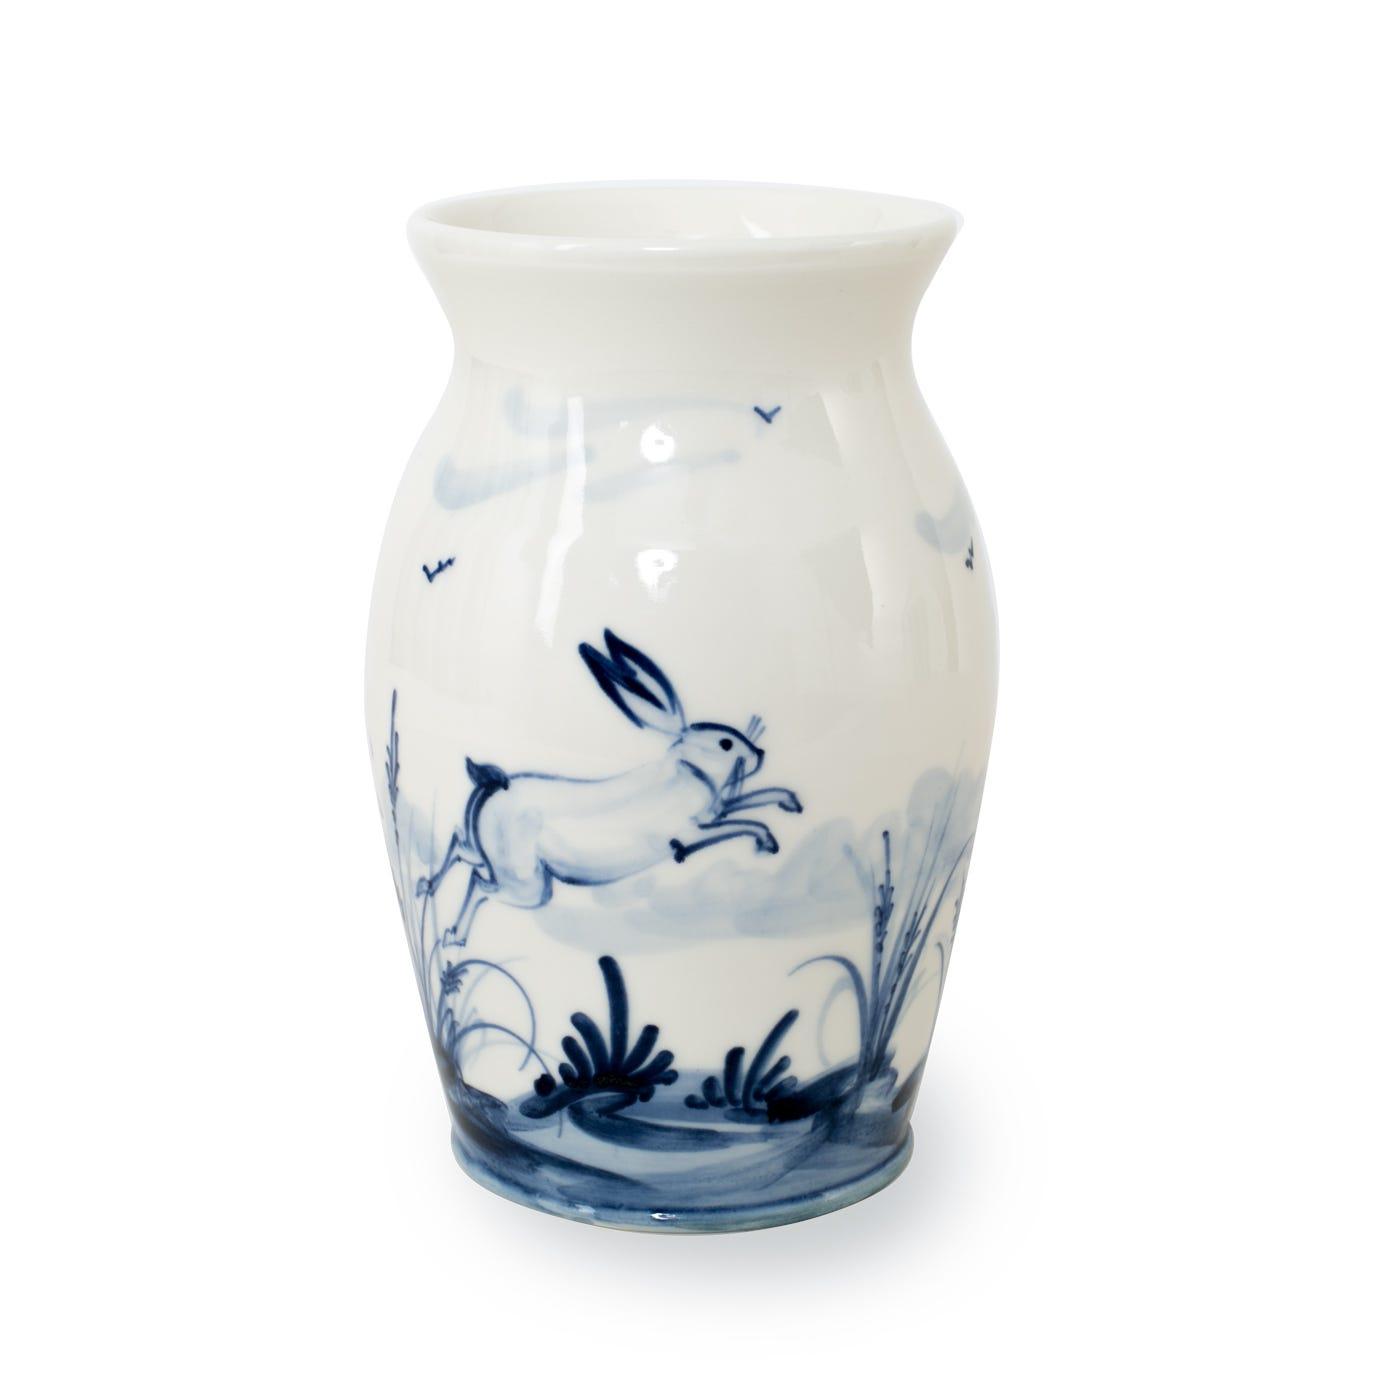 Hares Vase